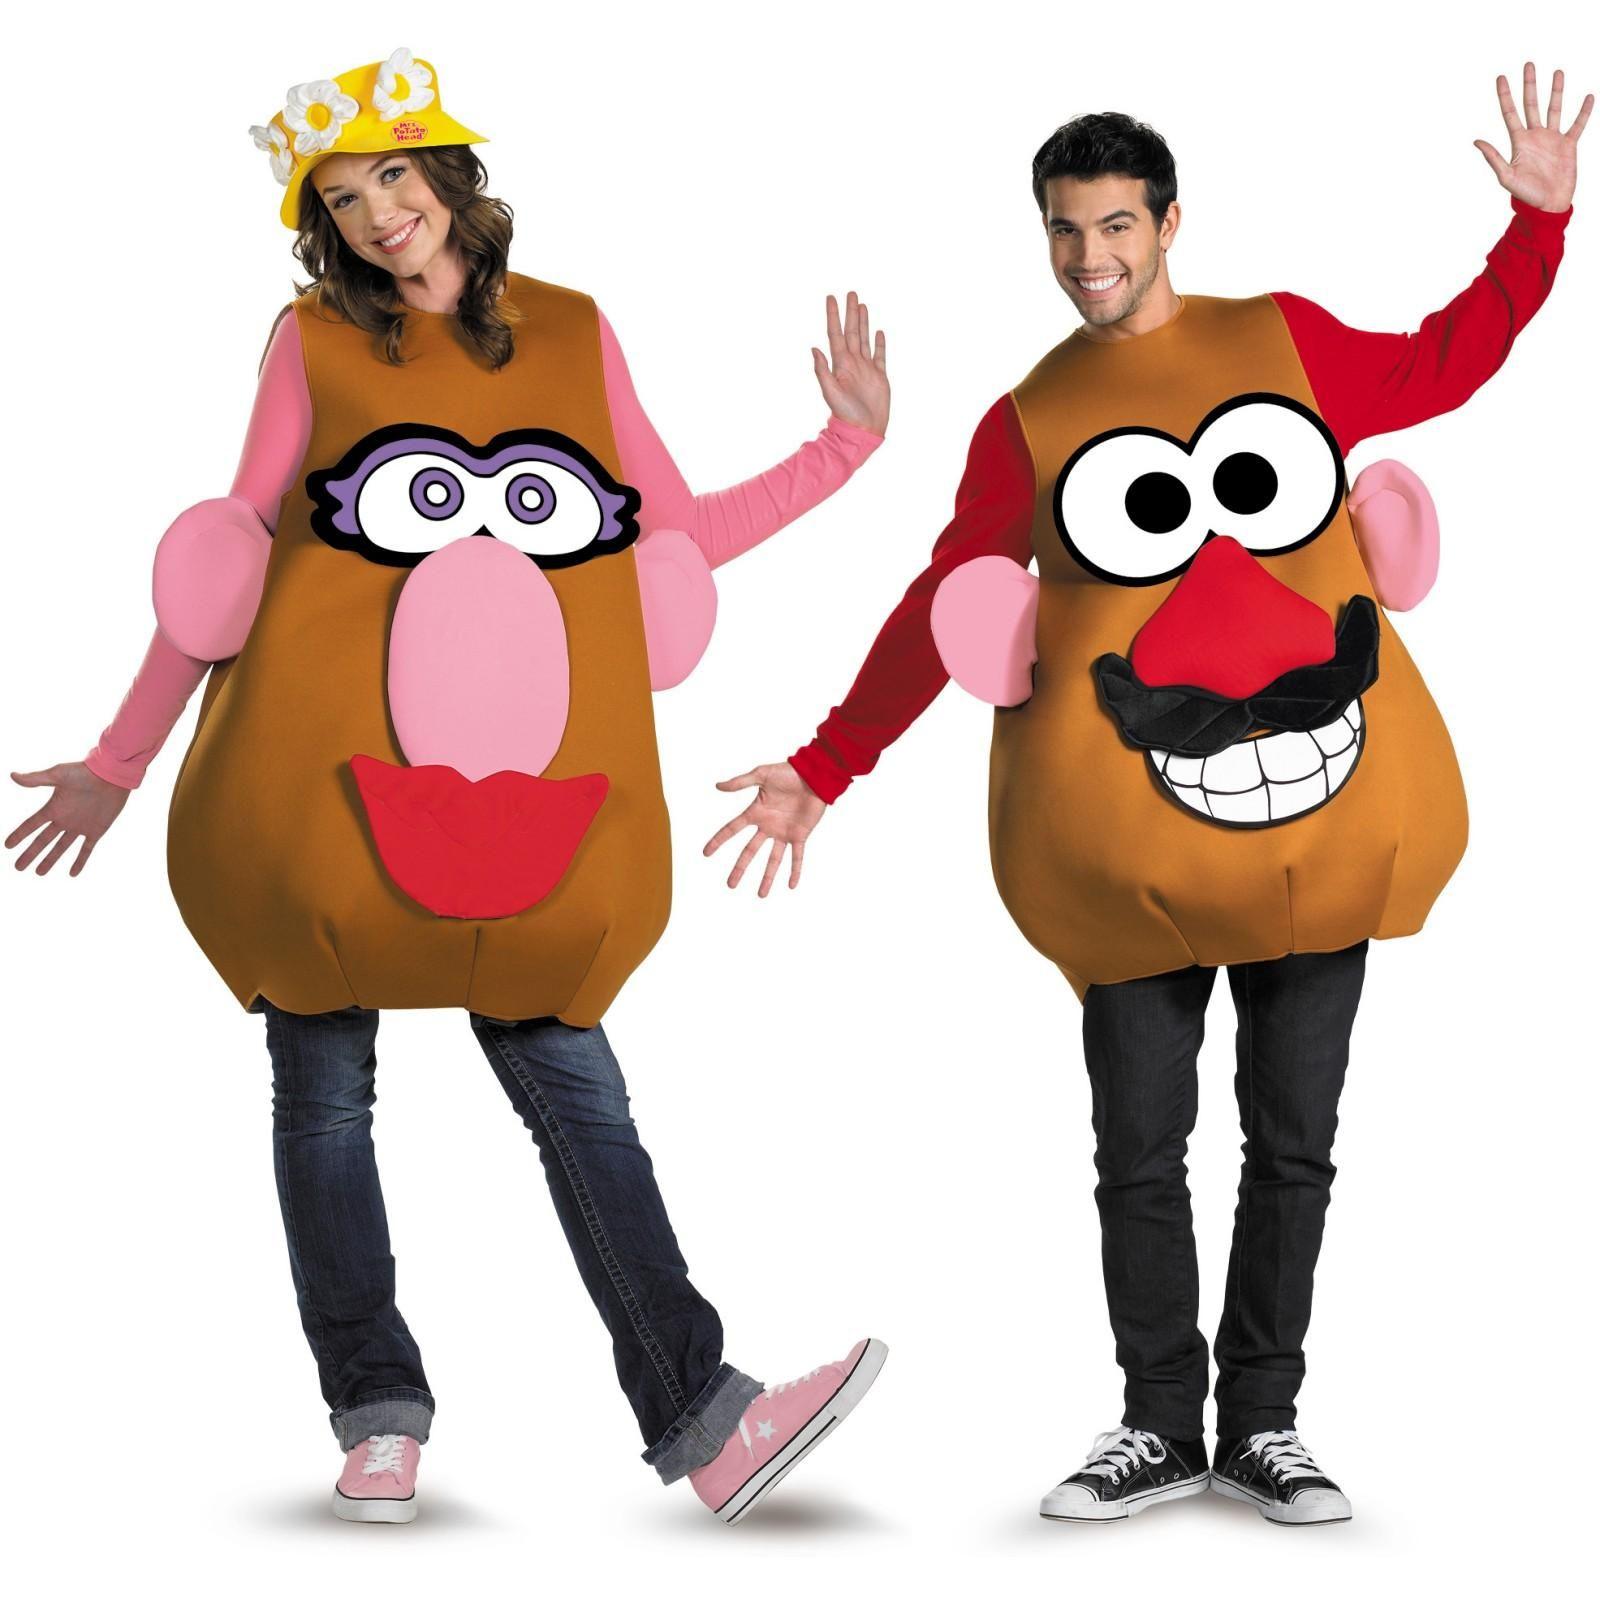 Mr. or Mrs. Potato Head Deluxe Adult Costume  sc 1 st  Pinterest & Adult Mister Or Ms Potato Head Costume | Pinterest | Potato heads ...